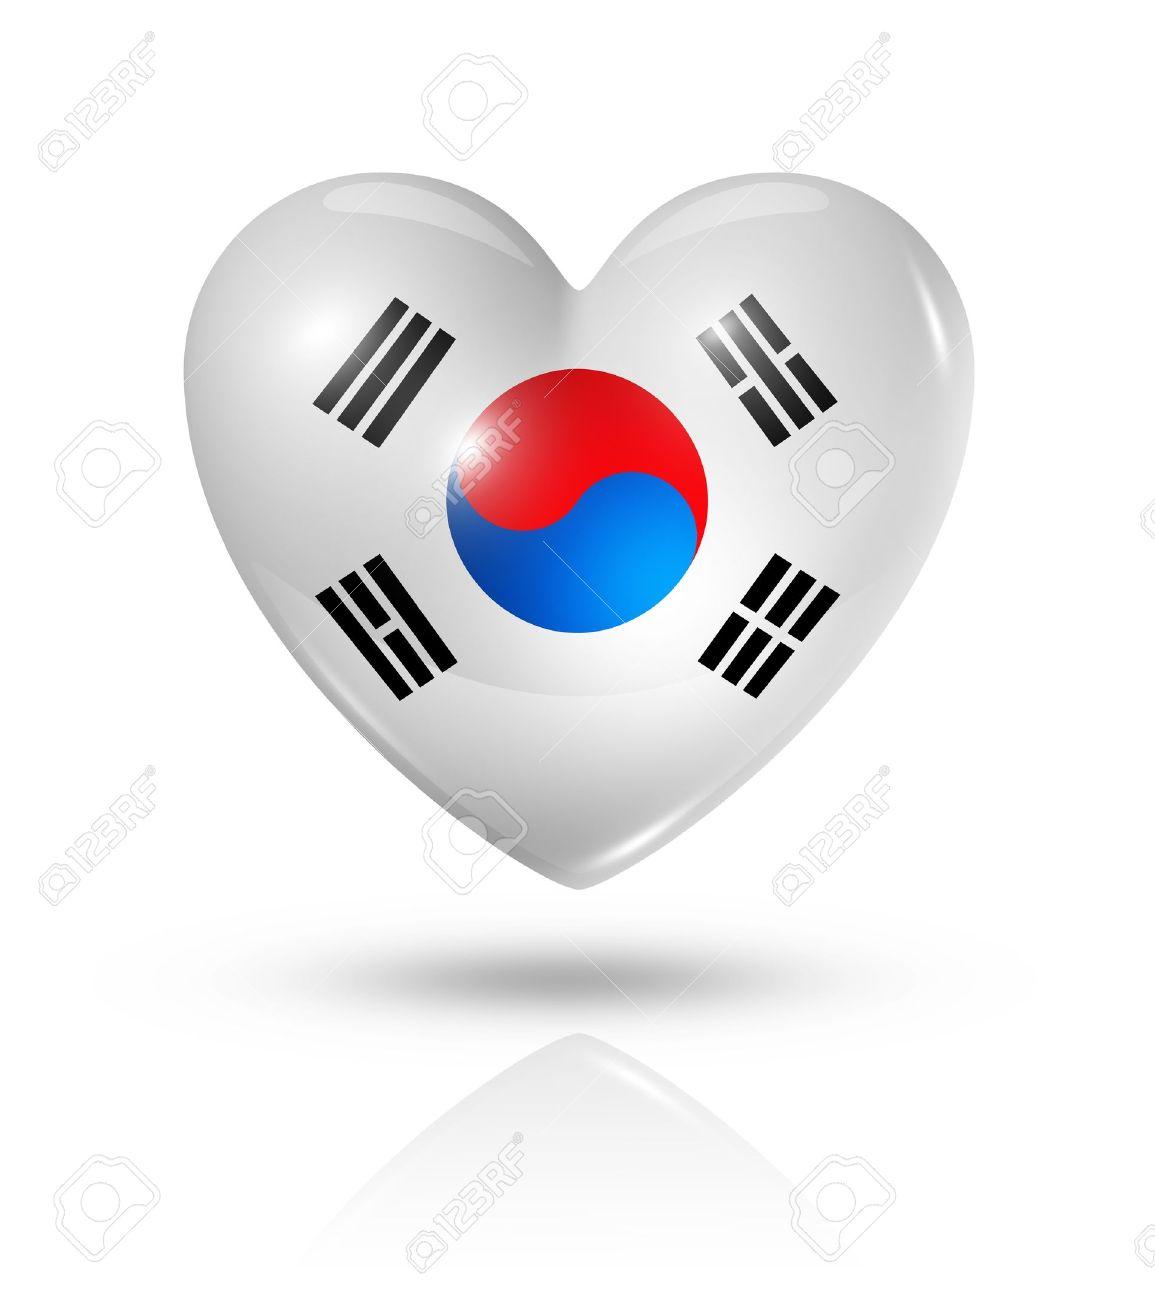 Love south korea symbol 3d heart flag stock photo picture and love south korea symbol 3d heart flag stock photo 22160344 buycottarizona Choice Image